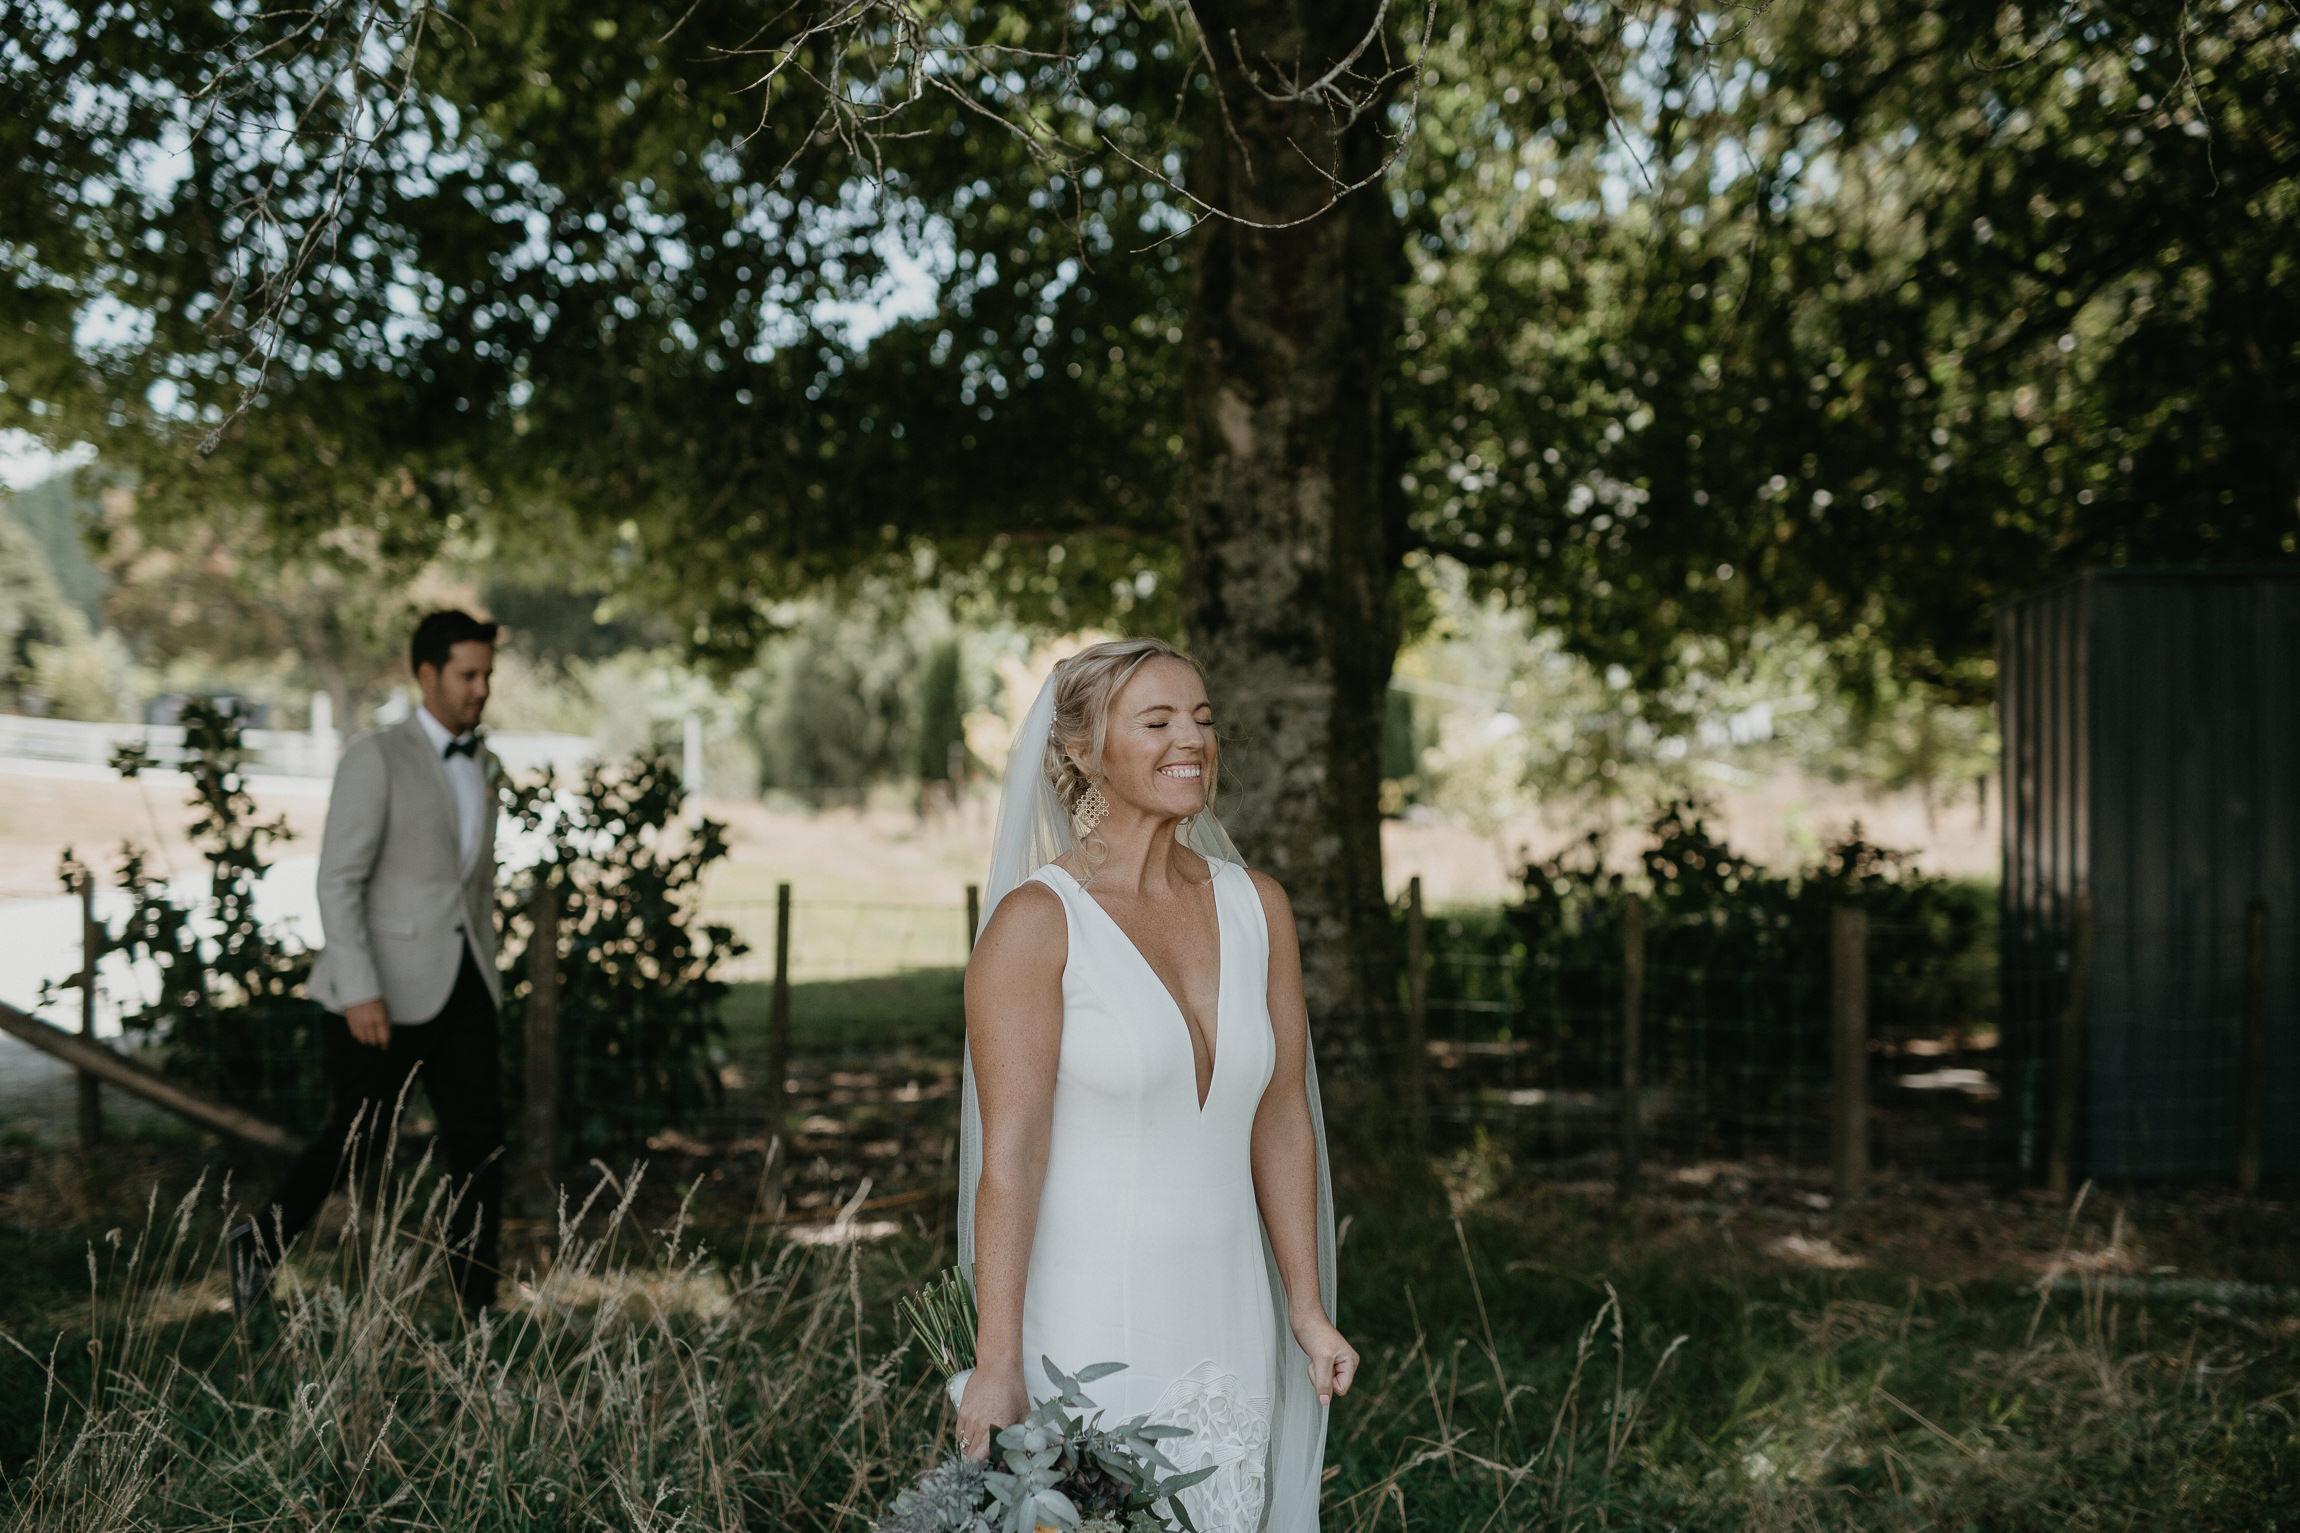 oldforestschool-wedding-blog-52.jpg